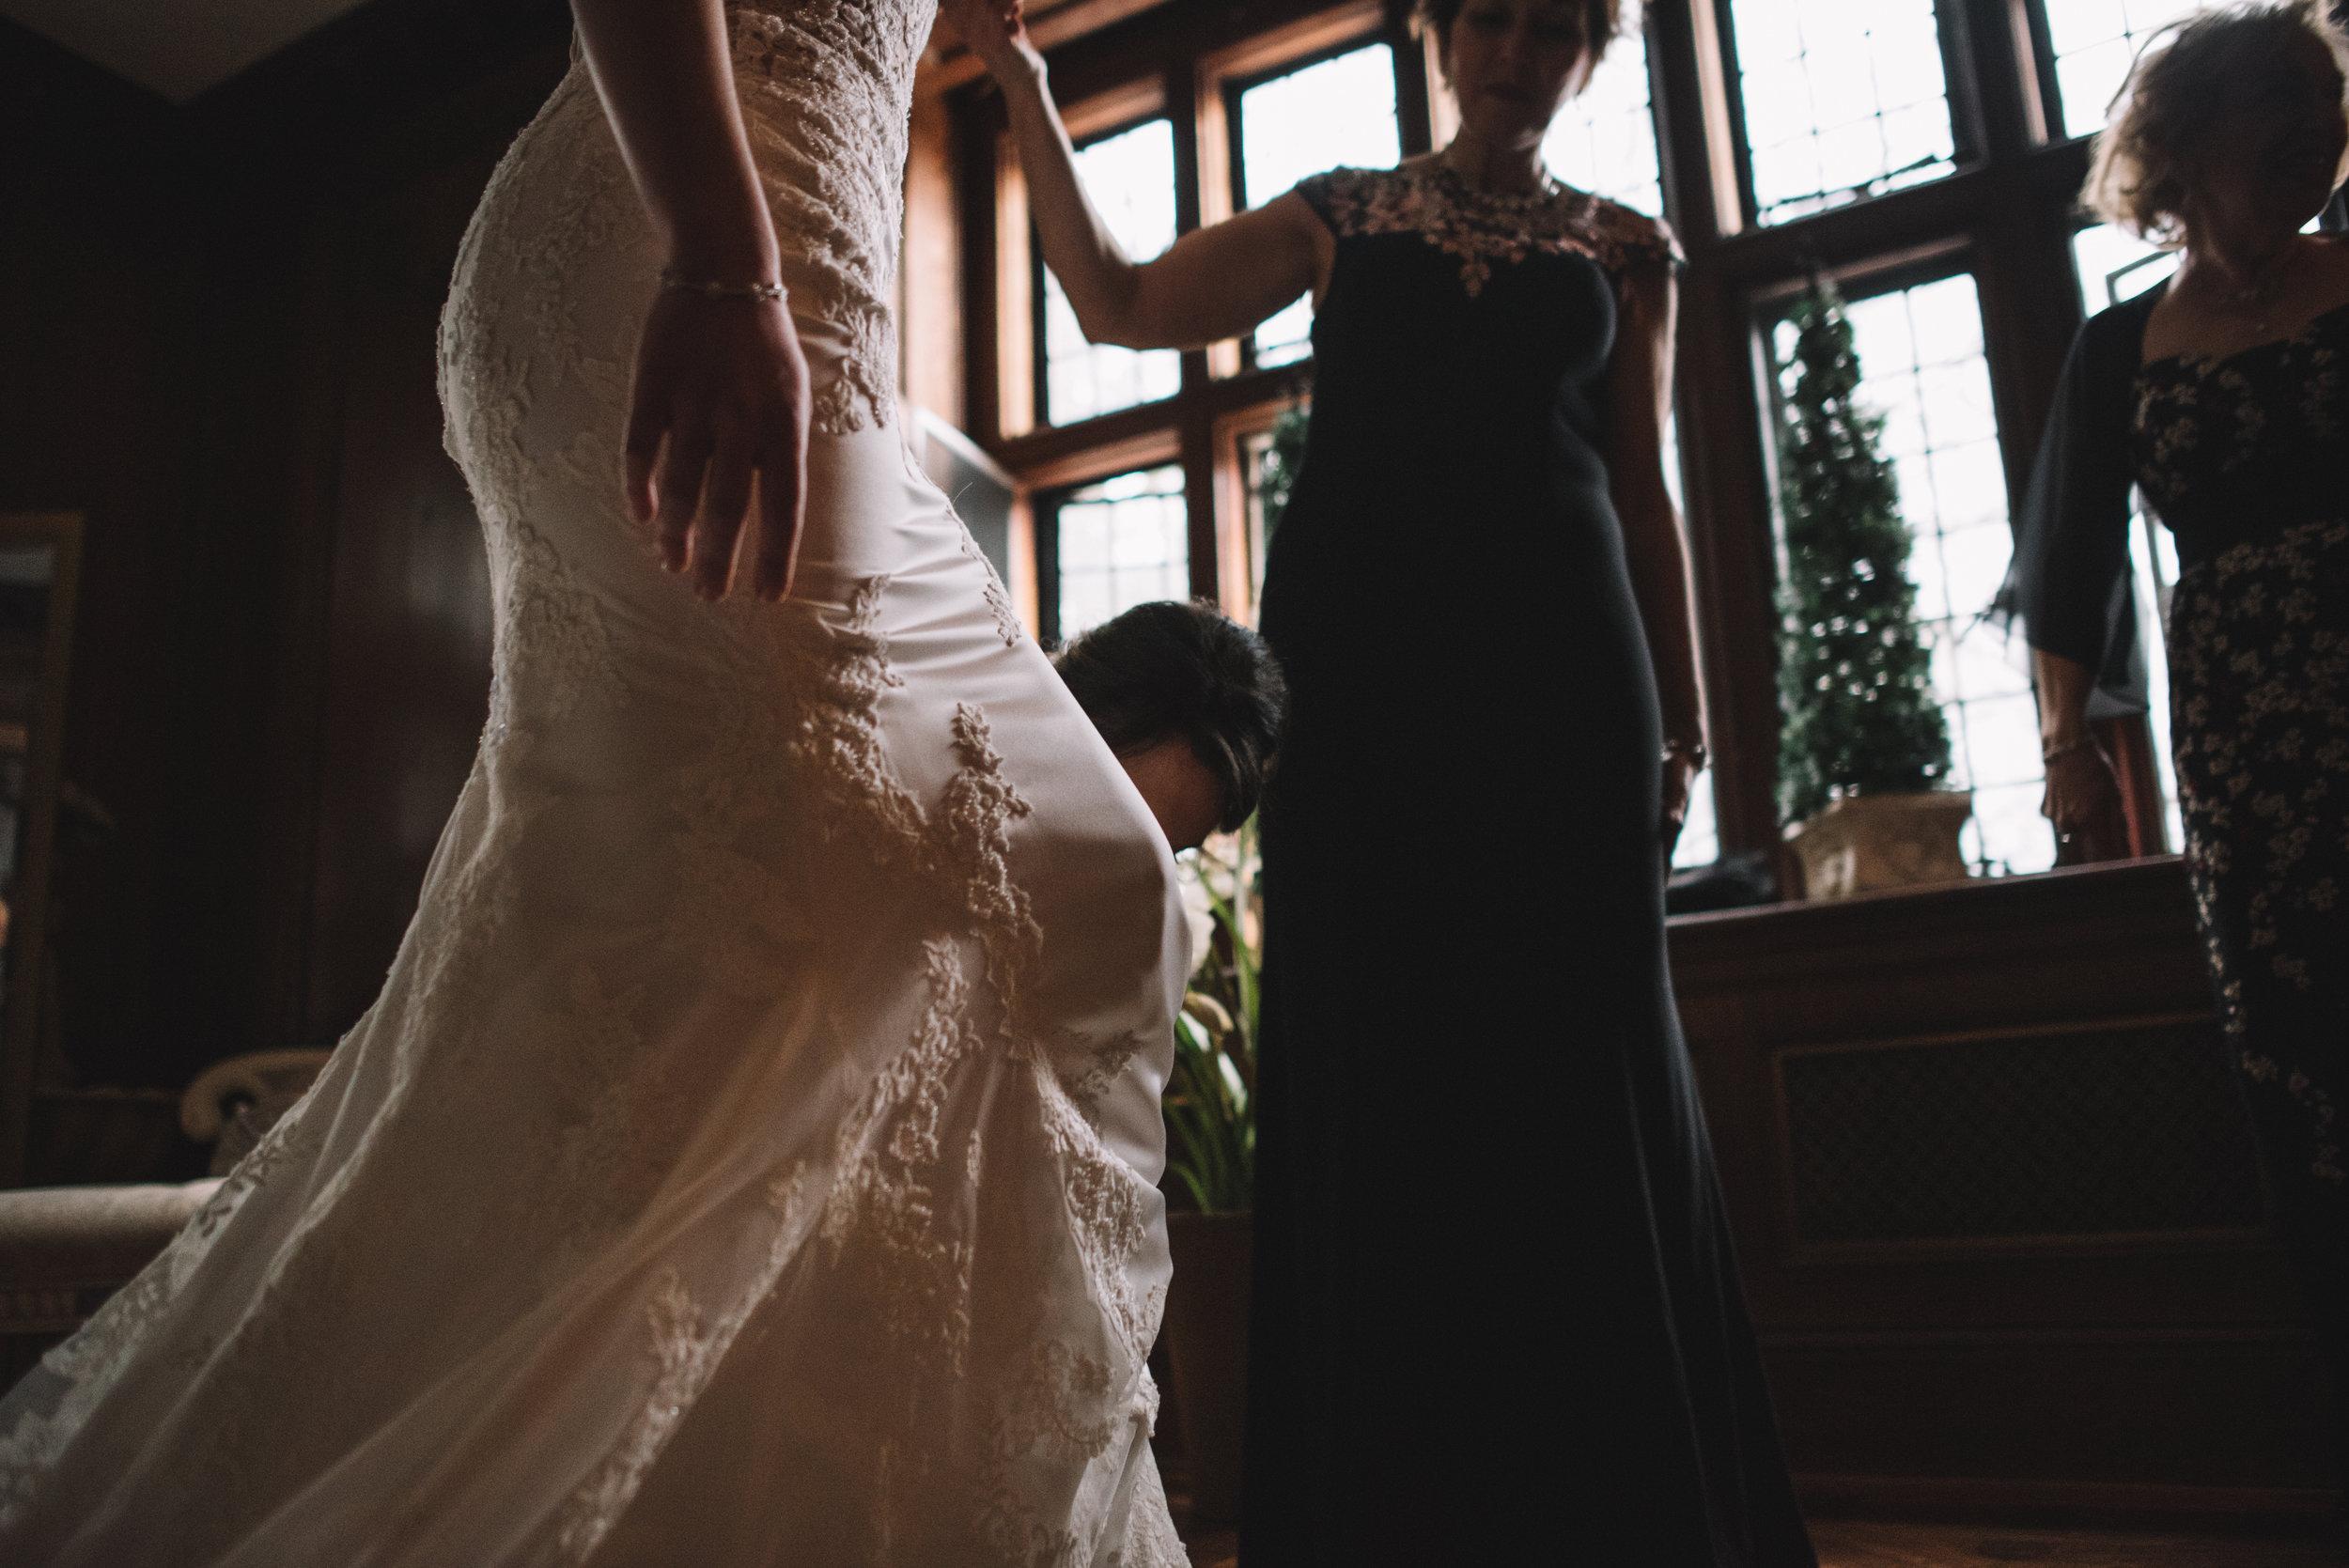 WeddingPhotos | NJPhotographer | Highlights-1-15.jpg